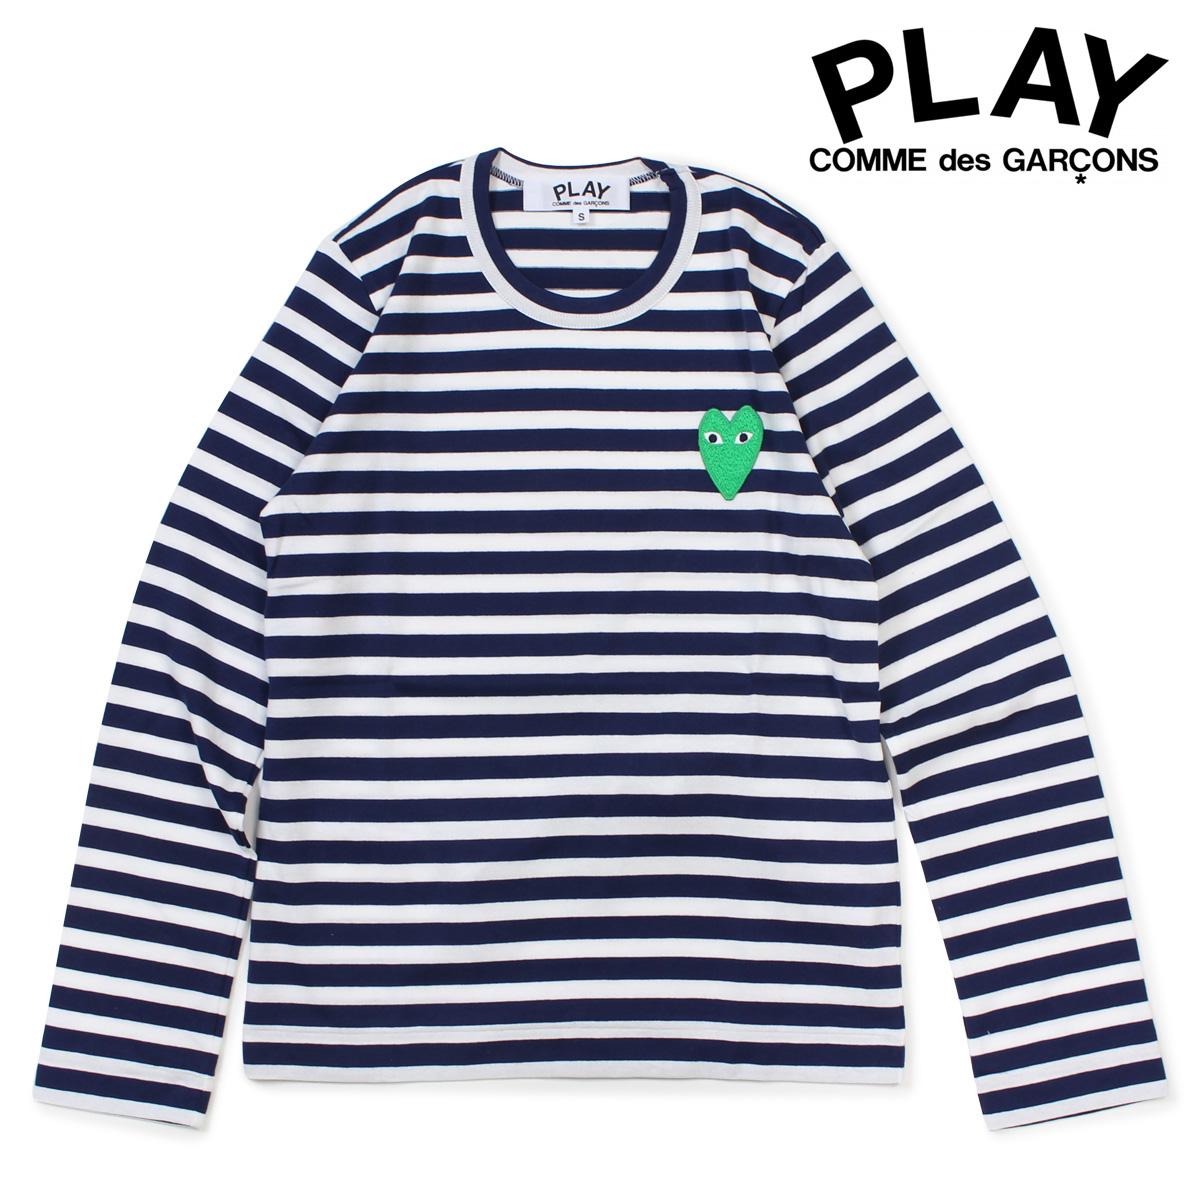 COMME des GARCONS PLAY Tシャツ 長袖 コムデギャルソン レディース HEART LS T-SHIRT ボーダー カットソー AZ-T051 ホワイト